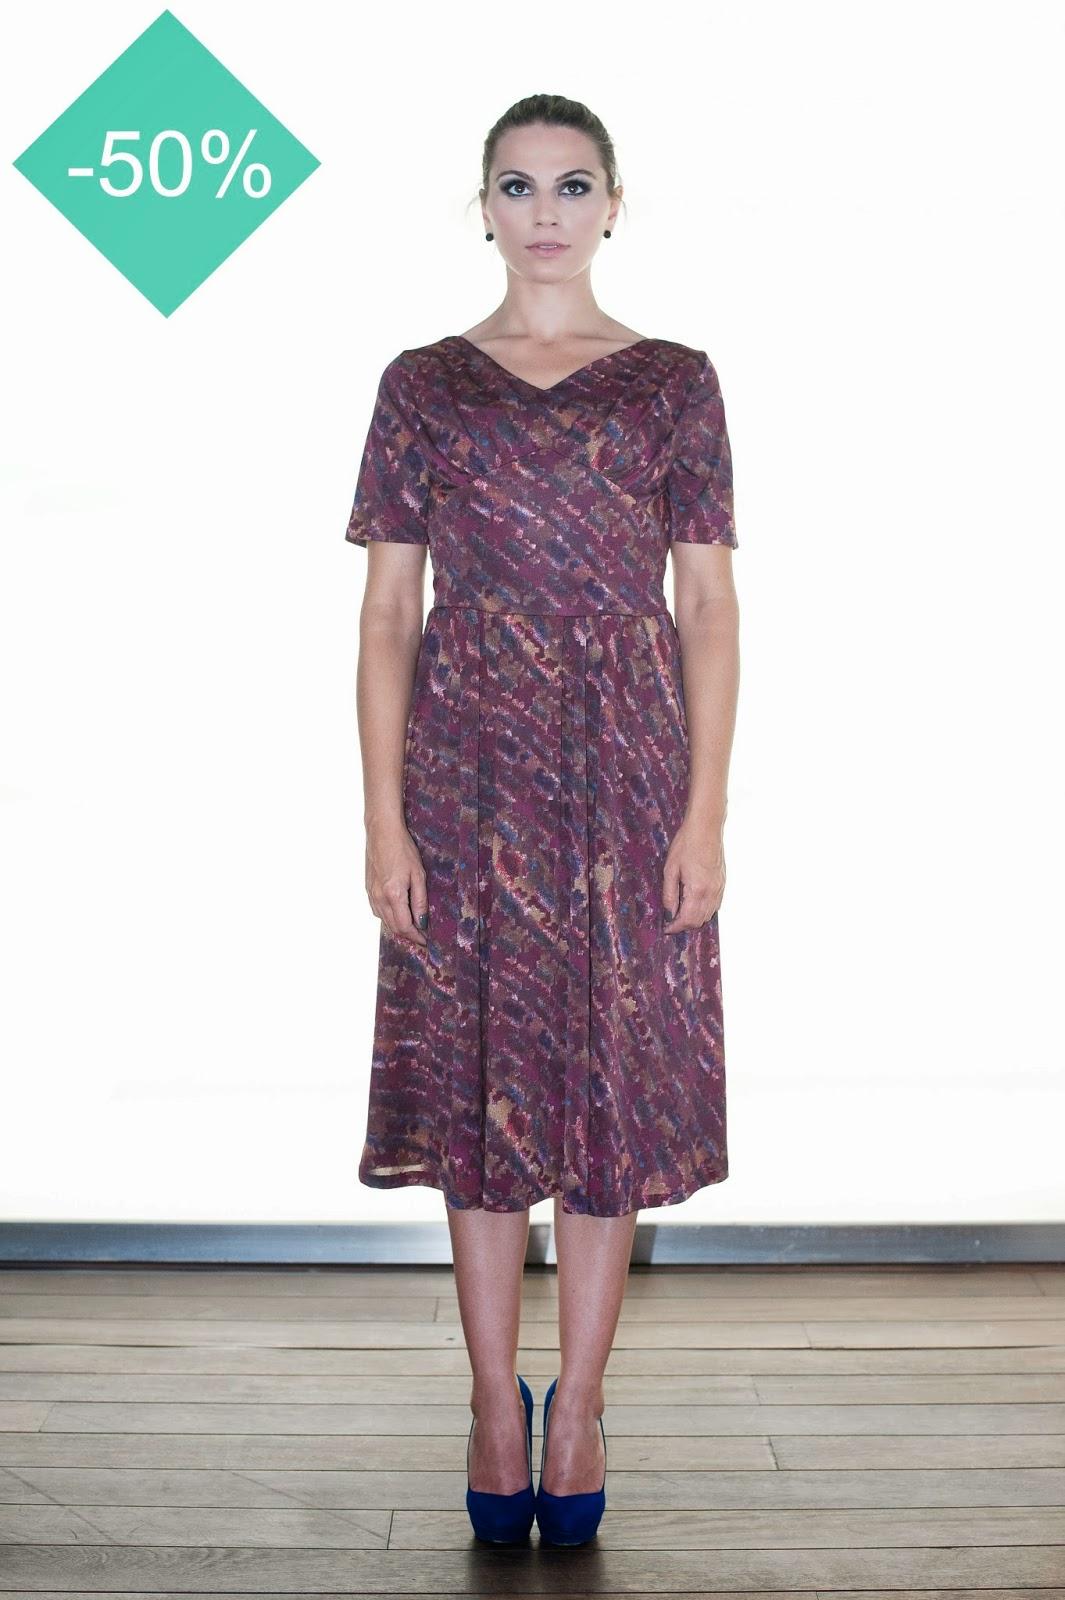 http://labocoqueshop.bigcartel.com/product/vestido-aurora#.Uuqyc_uIrA4